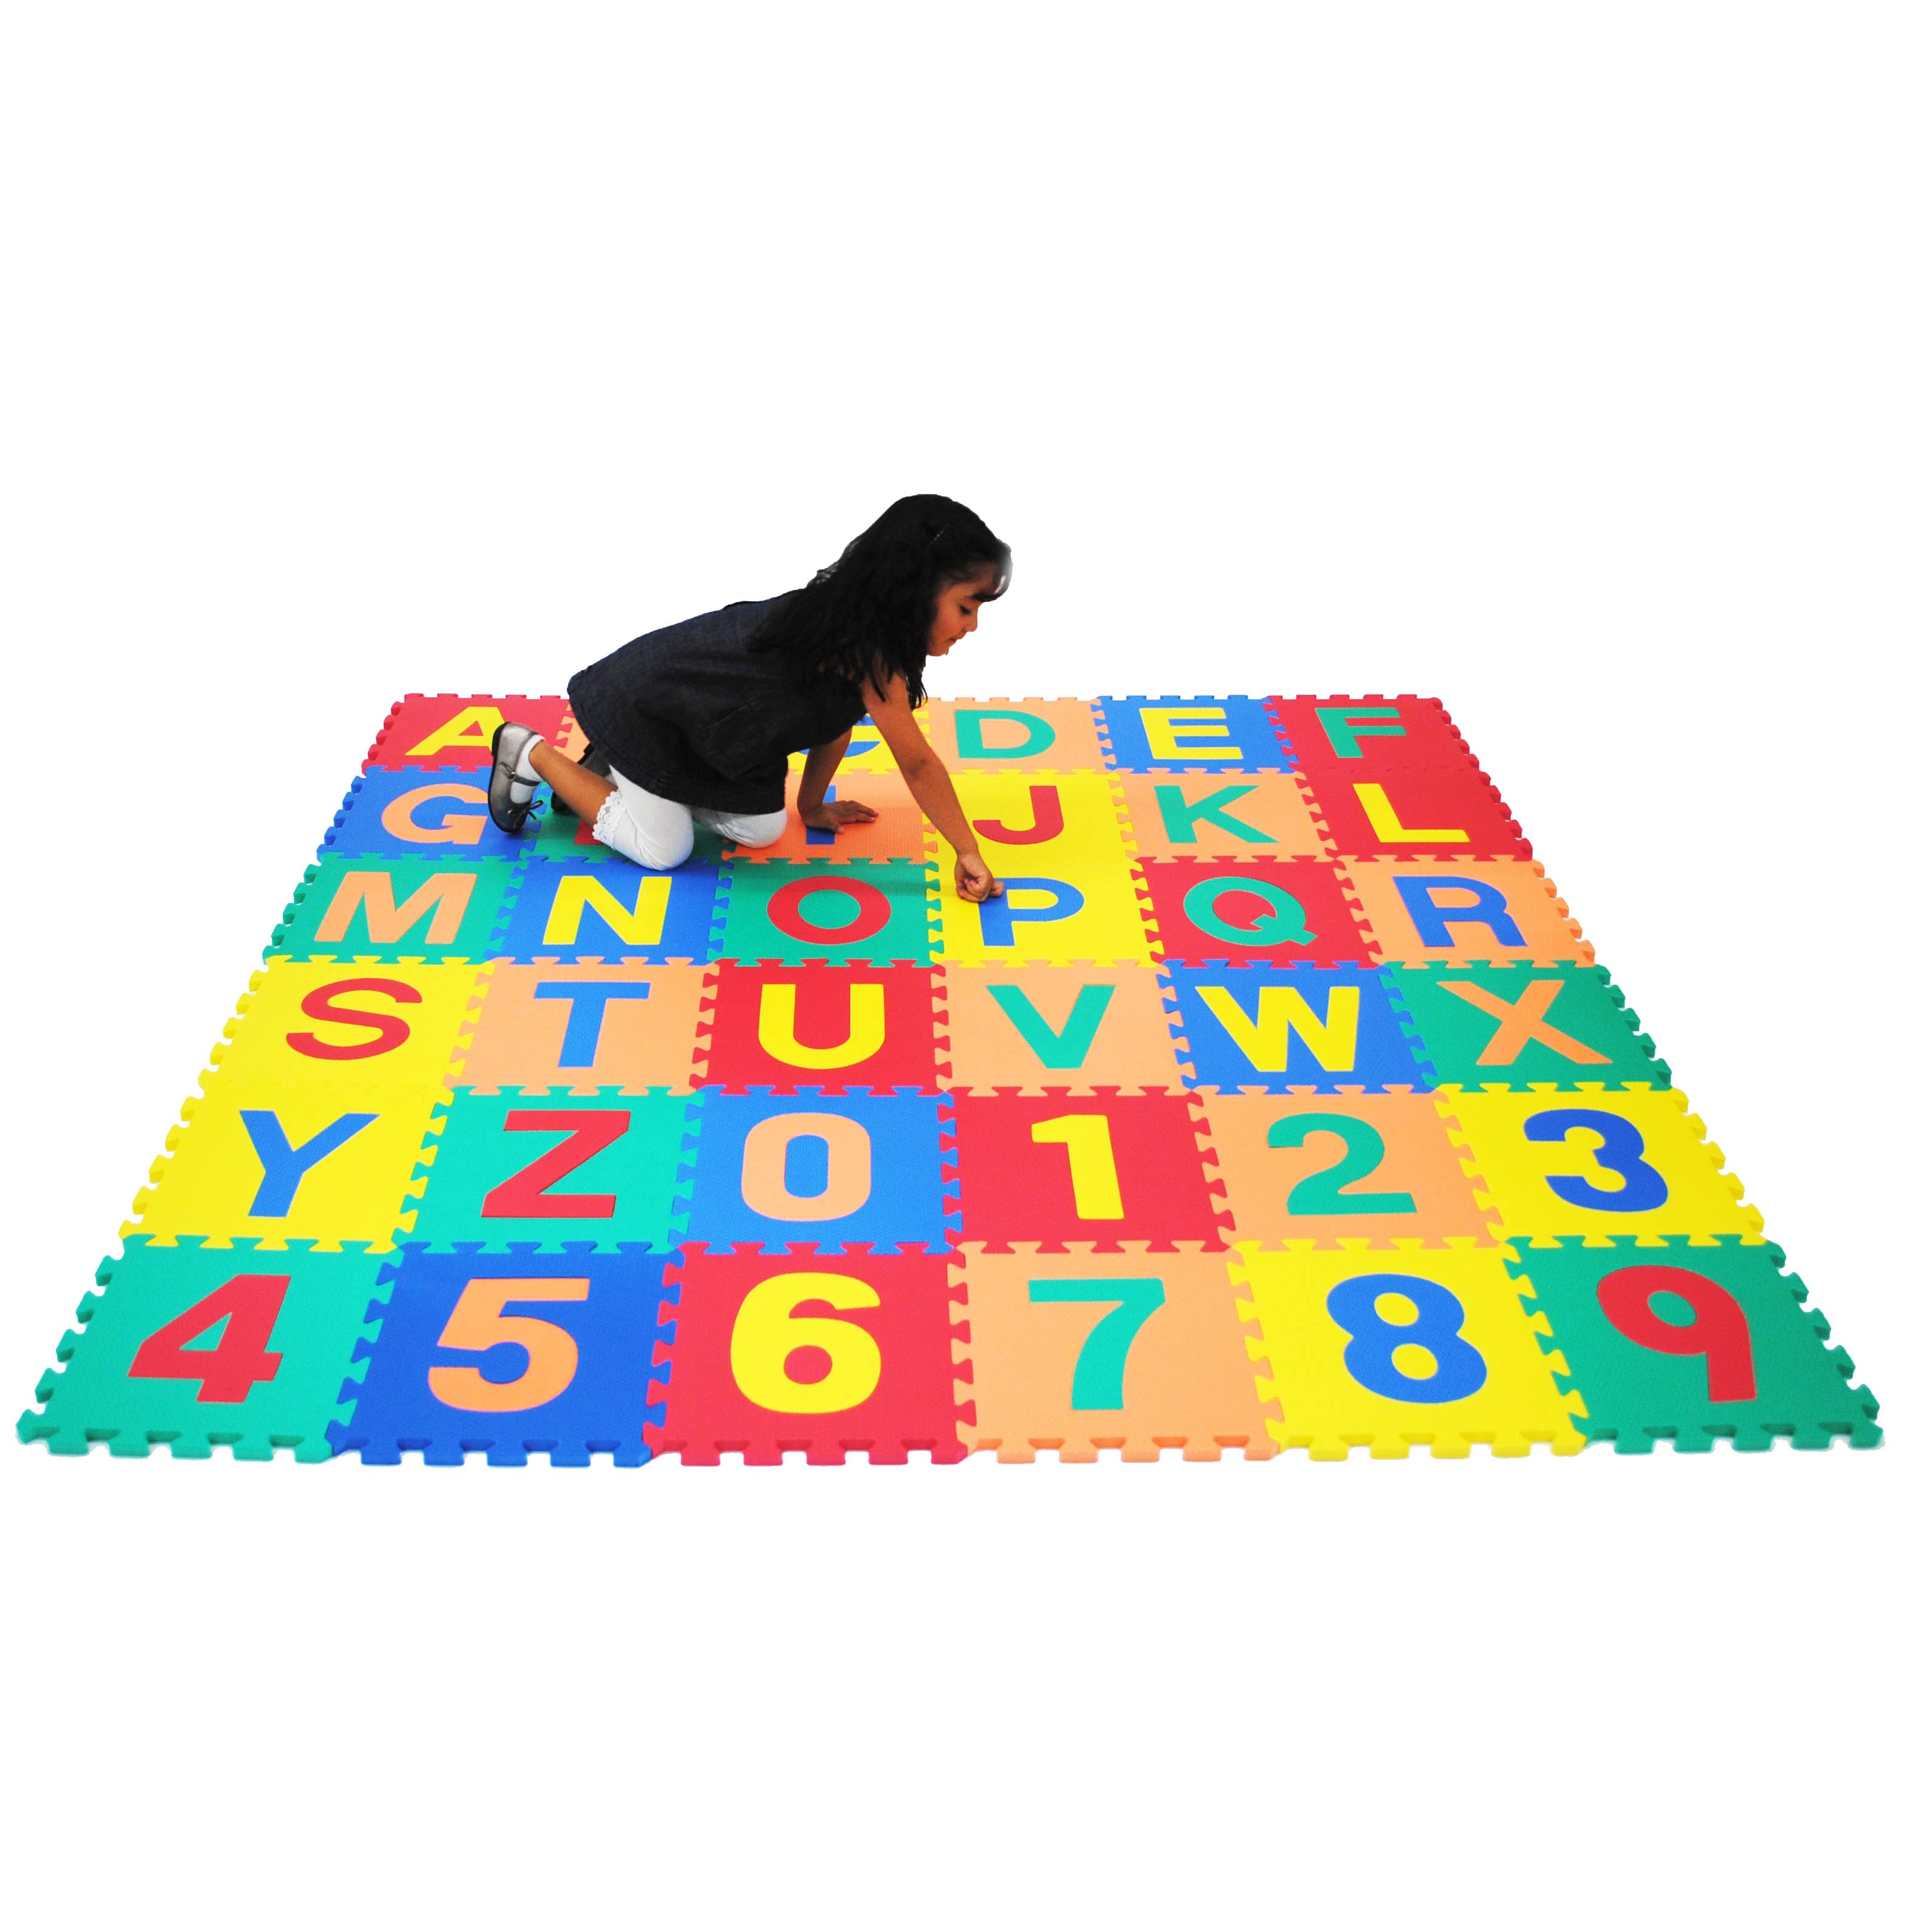 Floor clipart classroom rug. Https www ewonderworld com